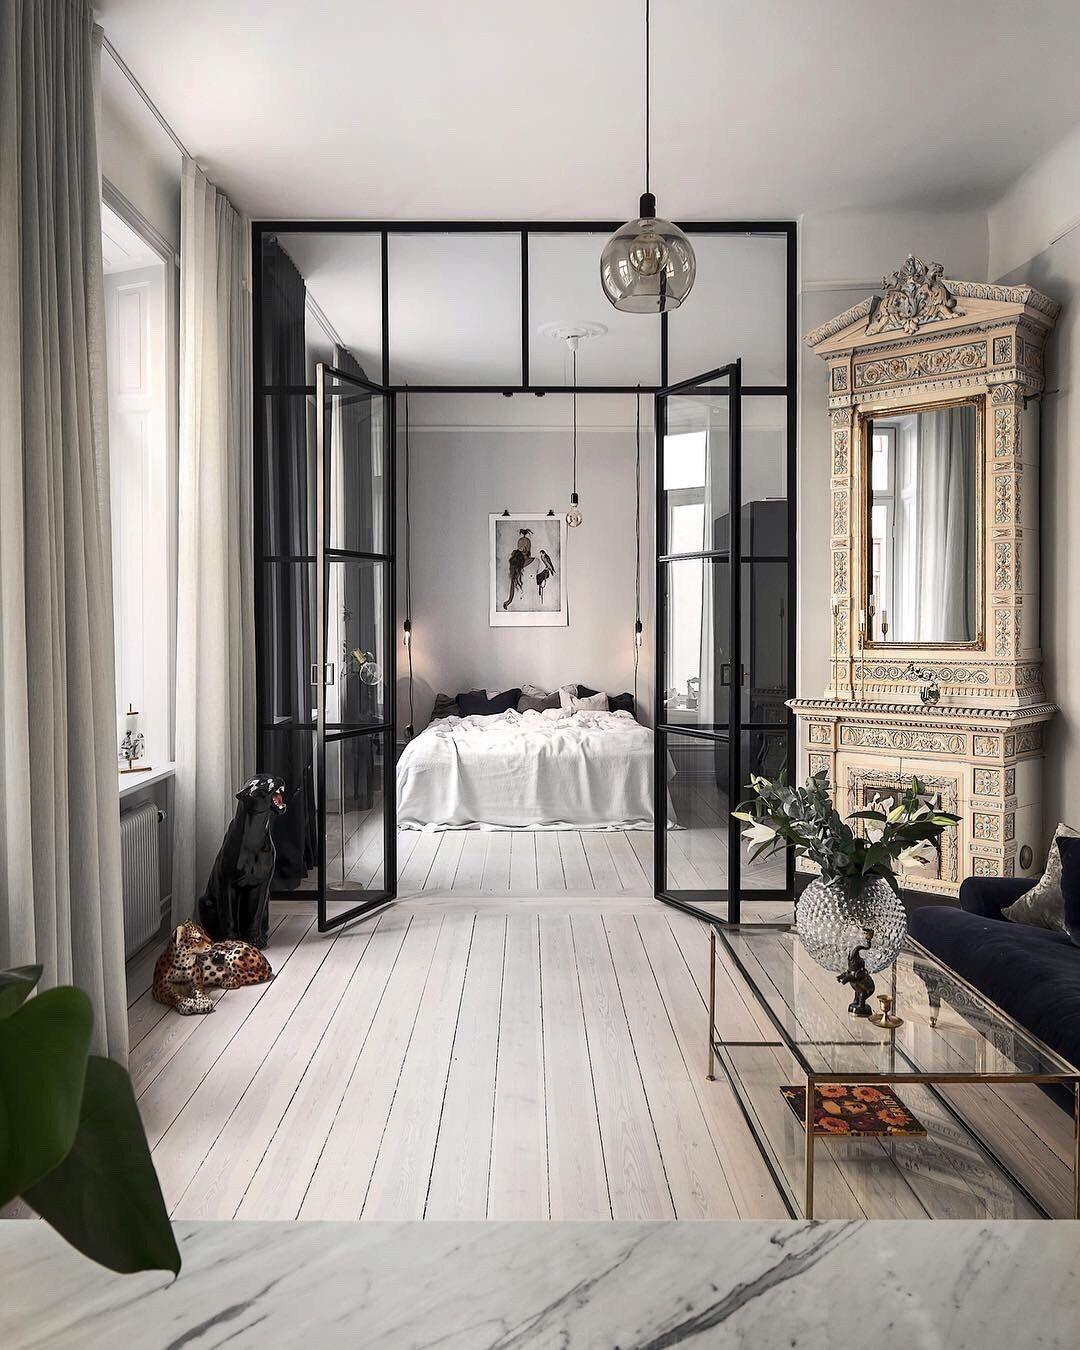 Meine Top 7 Der Skandinavischen Interieur Instagram Accounts Zu Folgen Bedroom Design Home House Interior